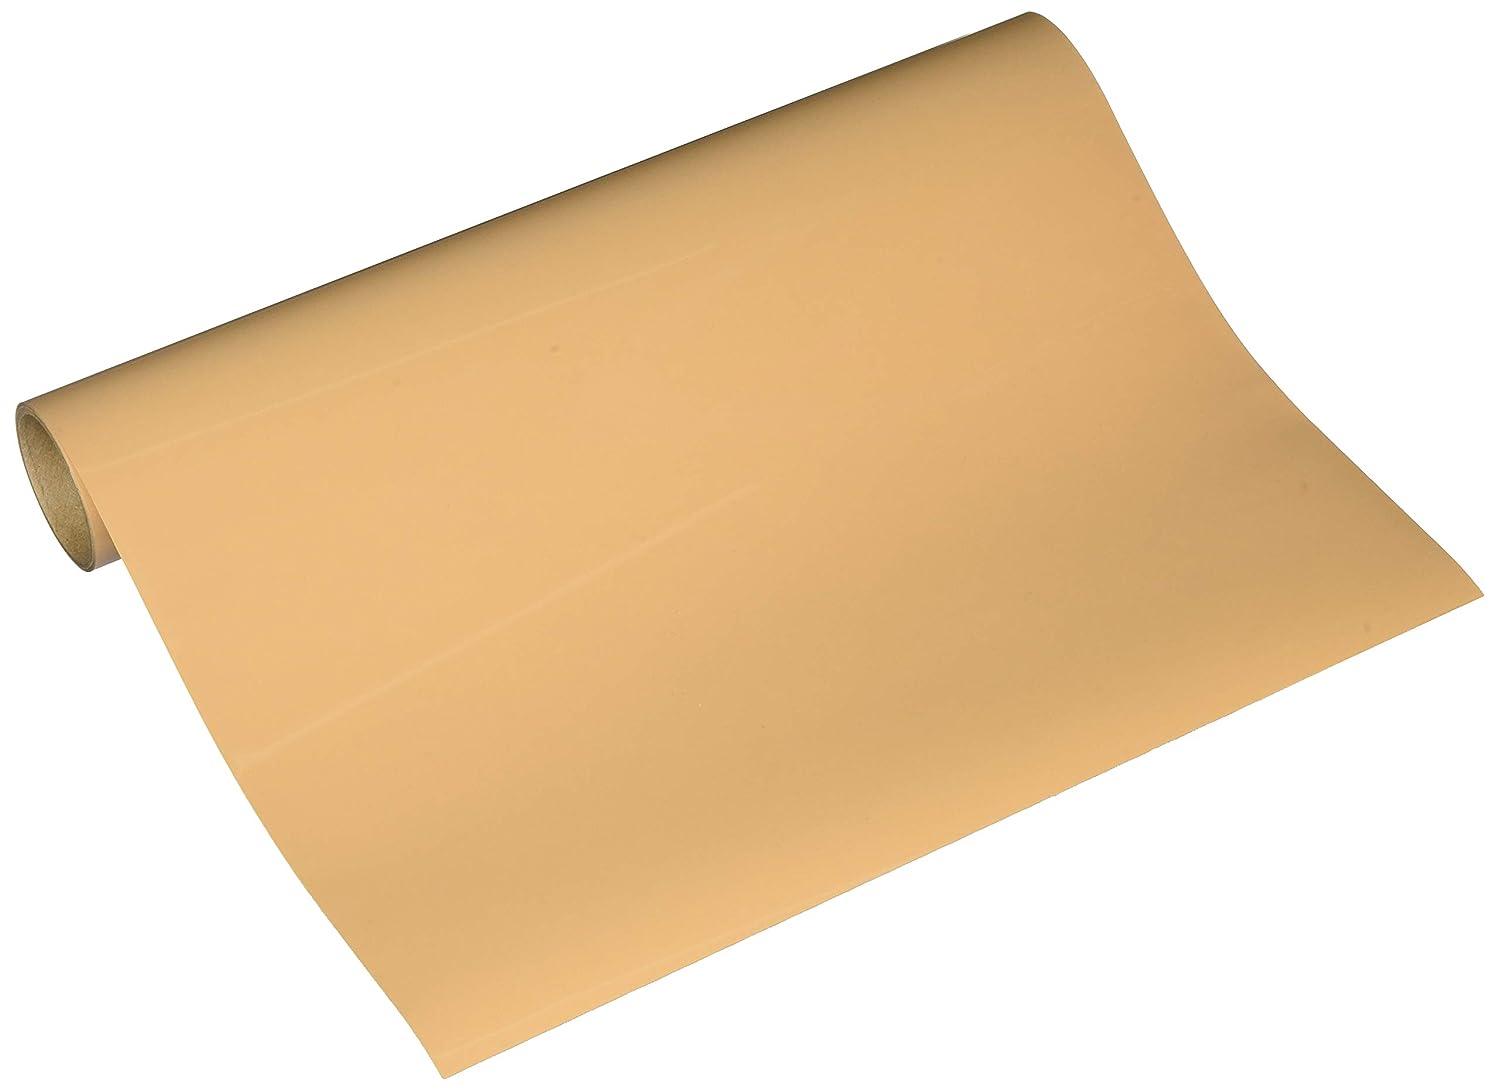 Siser 10041455 EasyWeed Vinyl: Tan, 11.8 x 36 inches Heat Transfer,